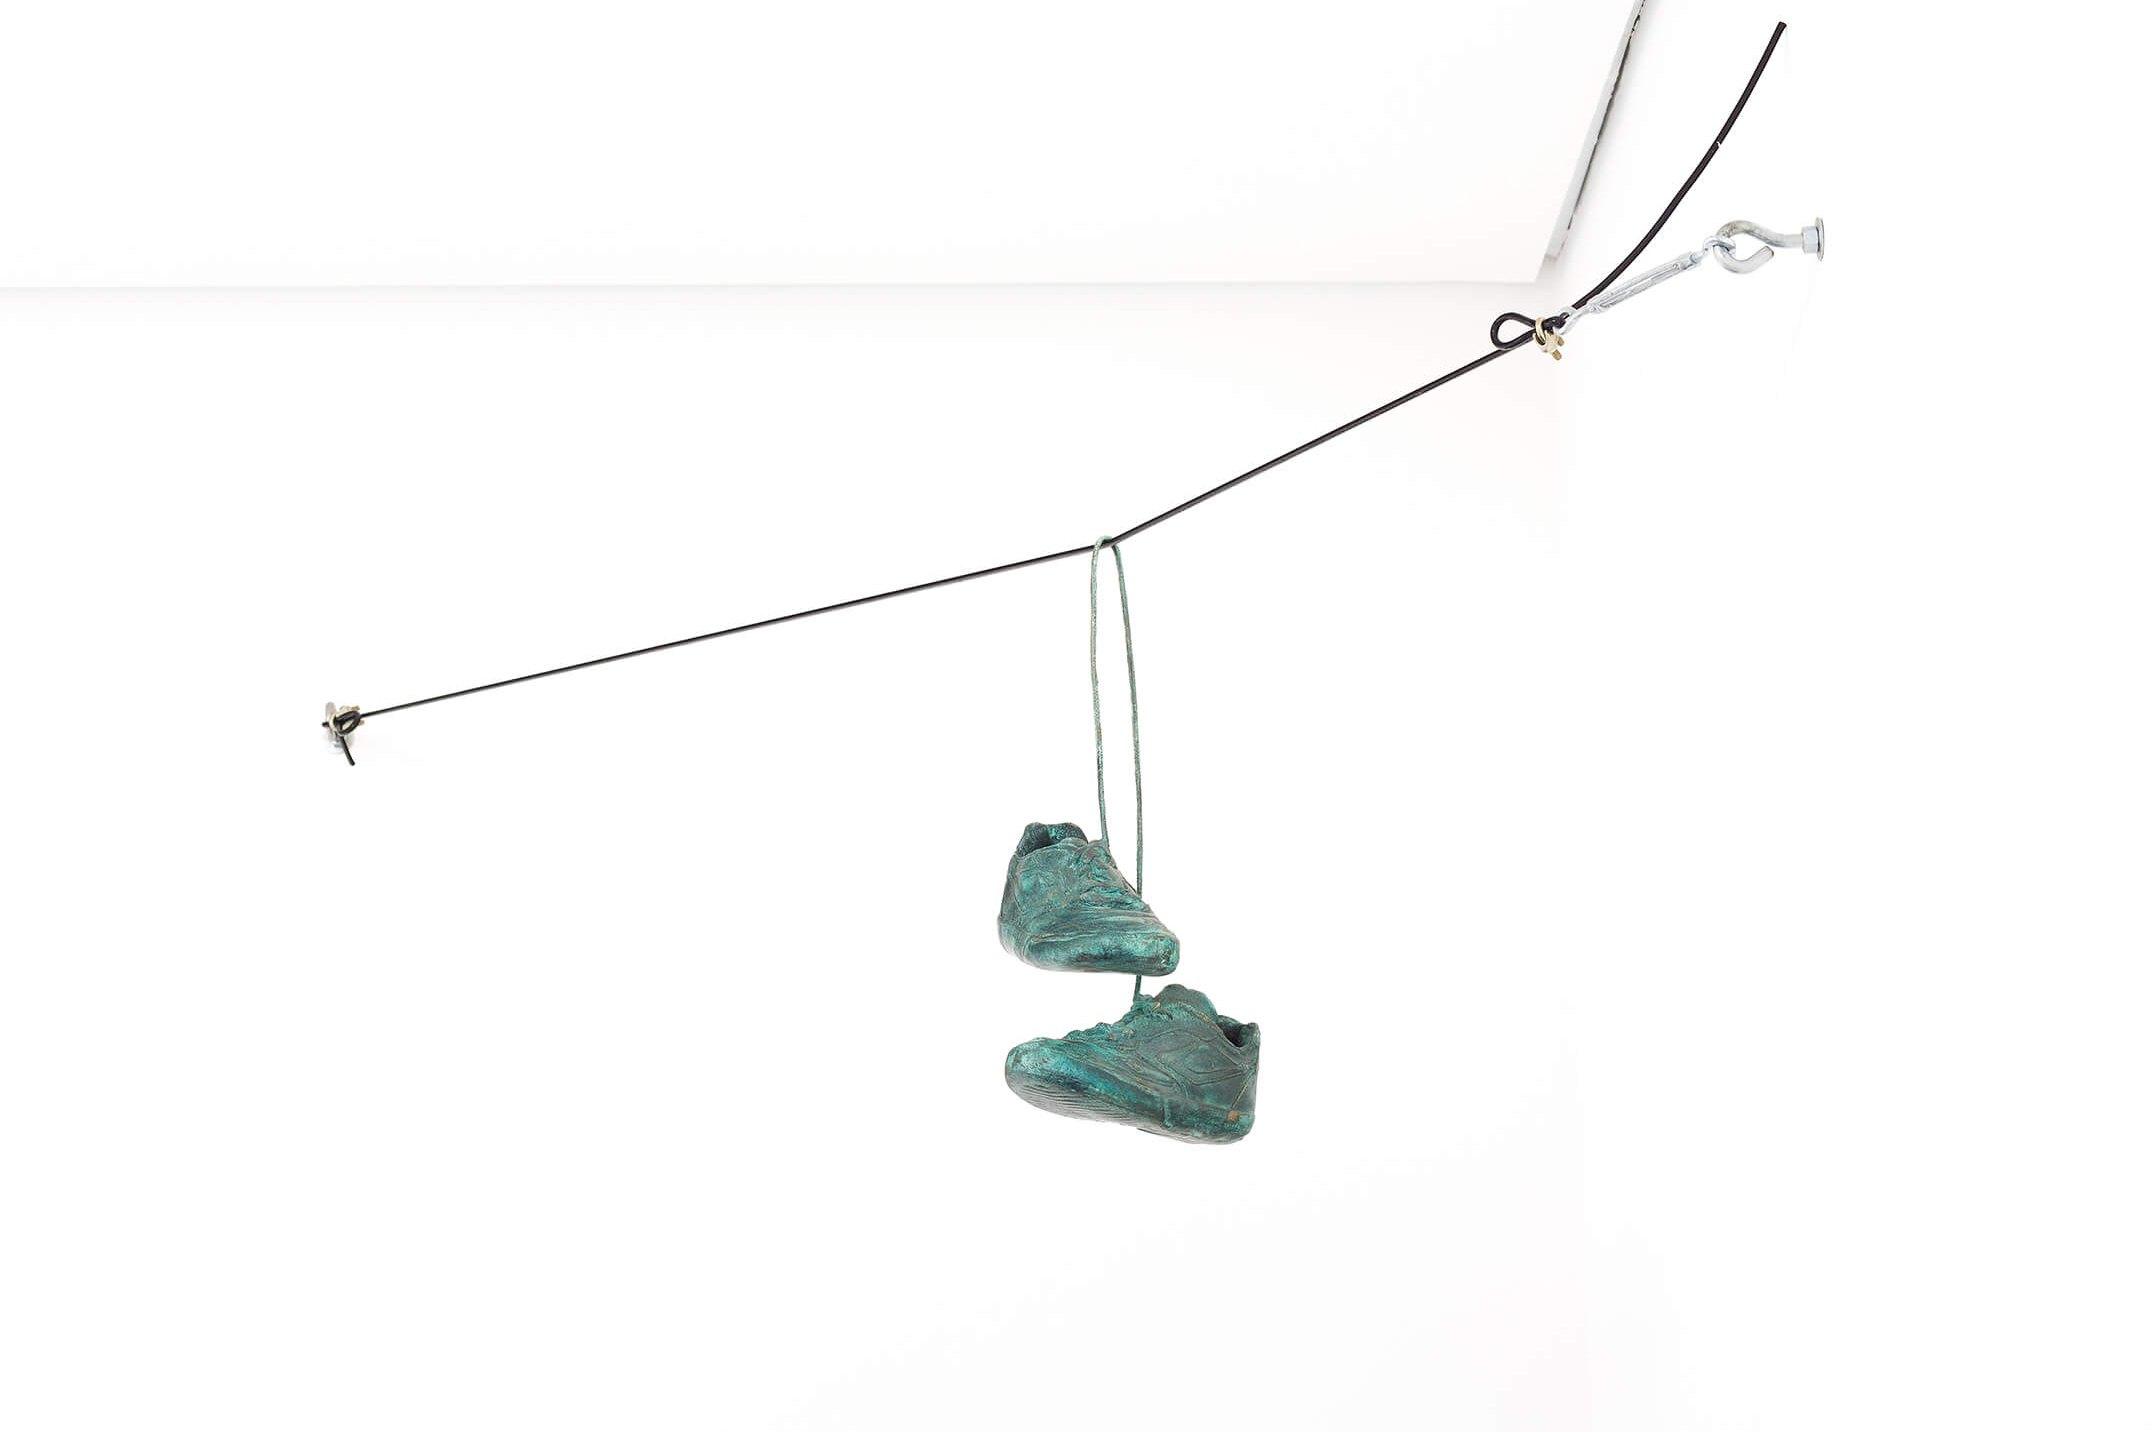 Haroon Gunn-Salie,<em> On the line,</em>2016,pair of shoes bronze plated,40× 22 × 26 cm - Mendes Wood DM